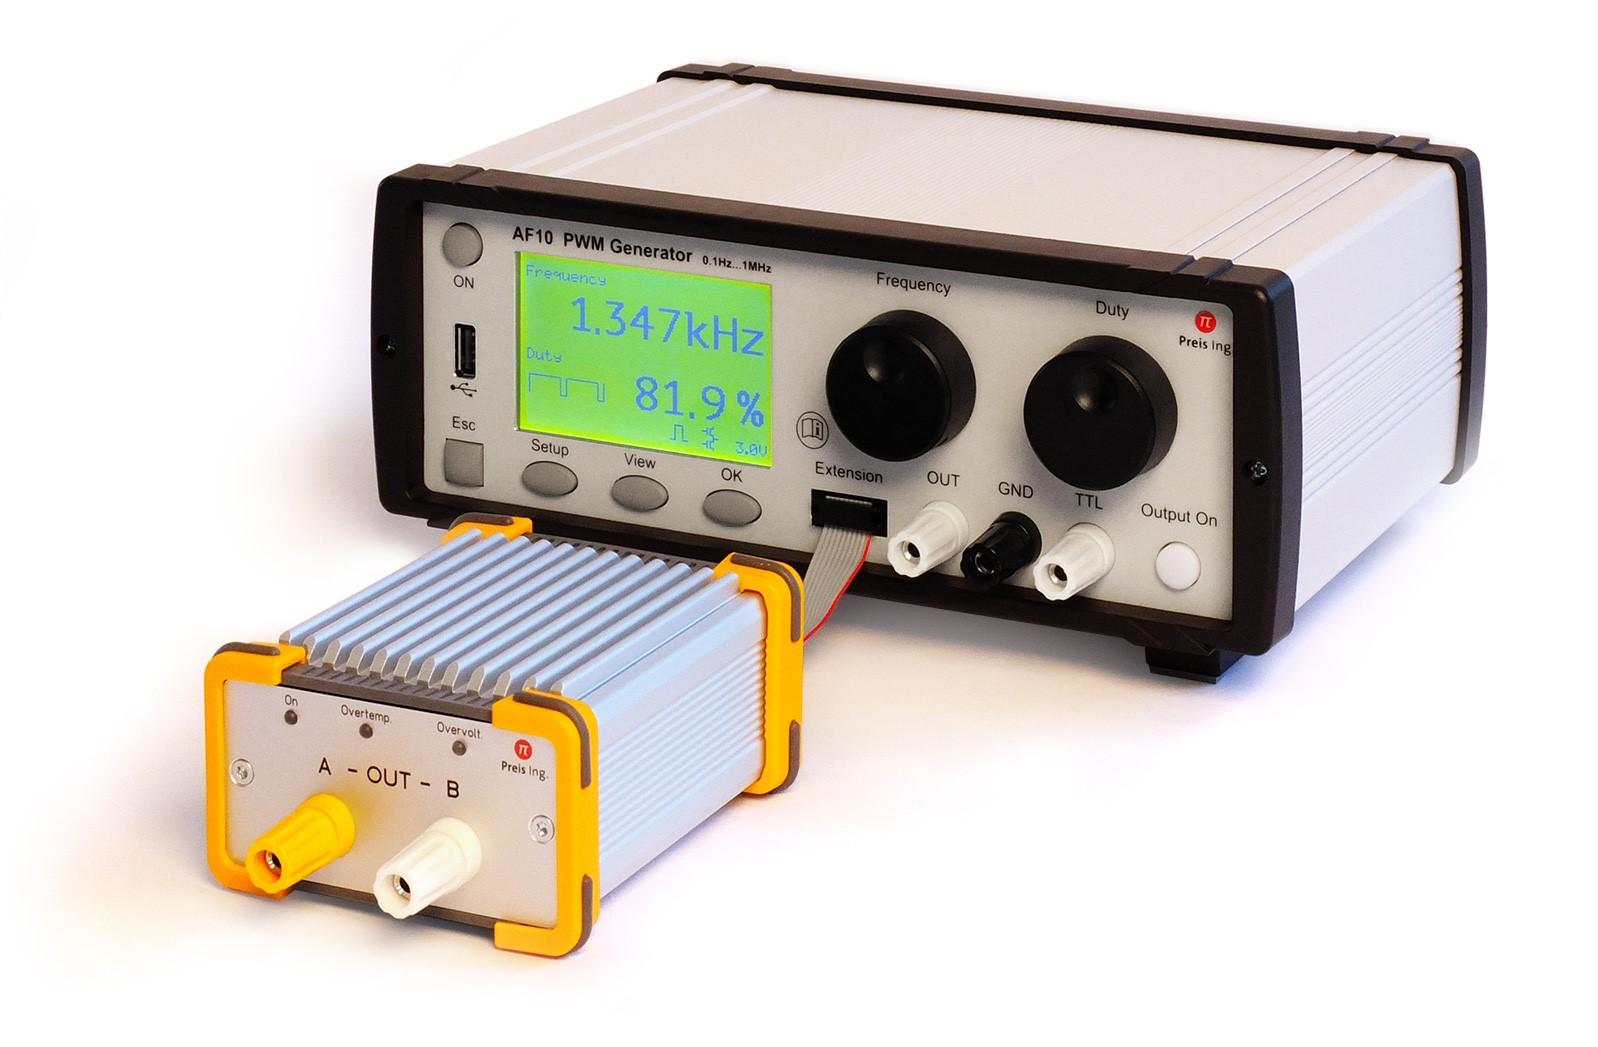 AF10: AF 10 PWM Generator mit Vollbrückenmodul full bridge module FBM 6020 Laborgerät oder Prüfstand